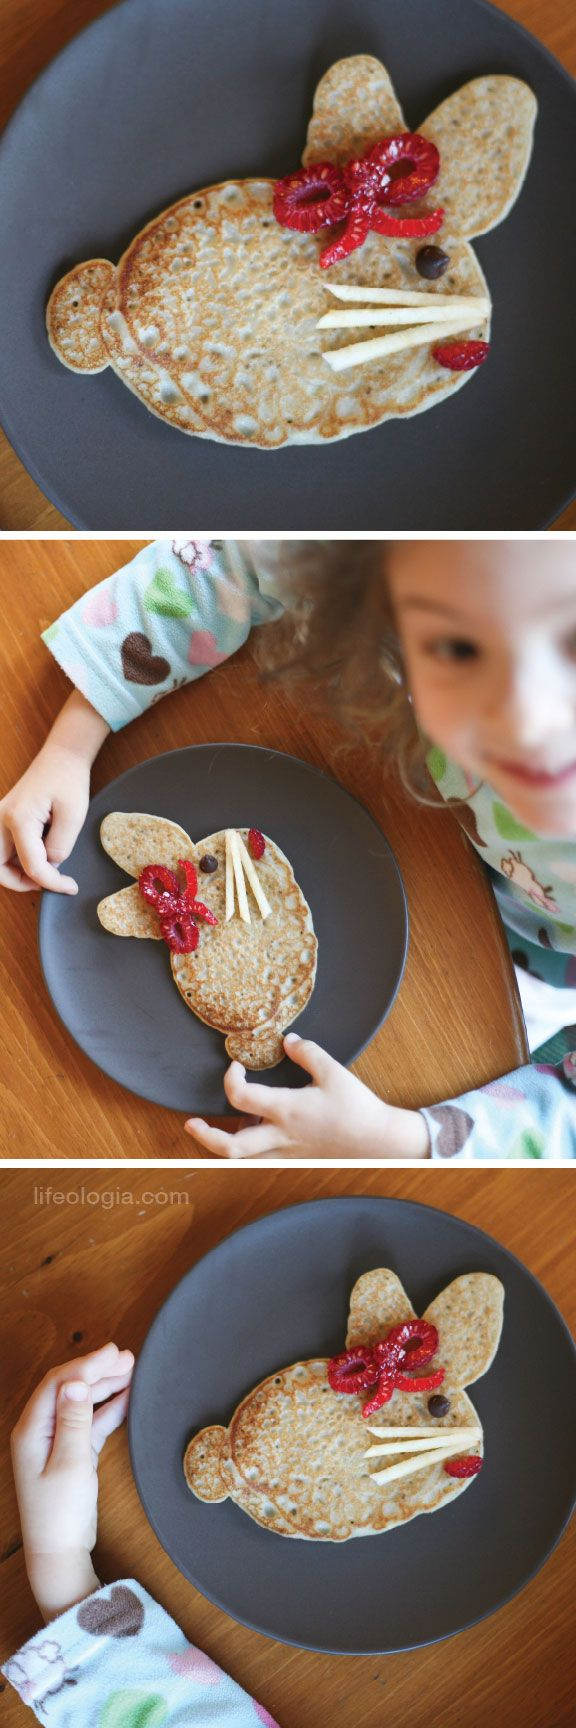 pancake bunnies: Breakfast Ideas, Brunch Ideas, Kiddo Food, Easter Bunnies, Easter Spr, Easter Food, Easter Bunny, Bunnies Pancakes, Easter Ideas